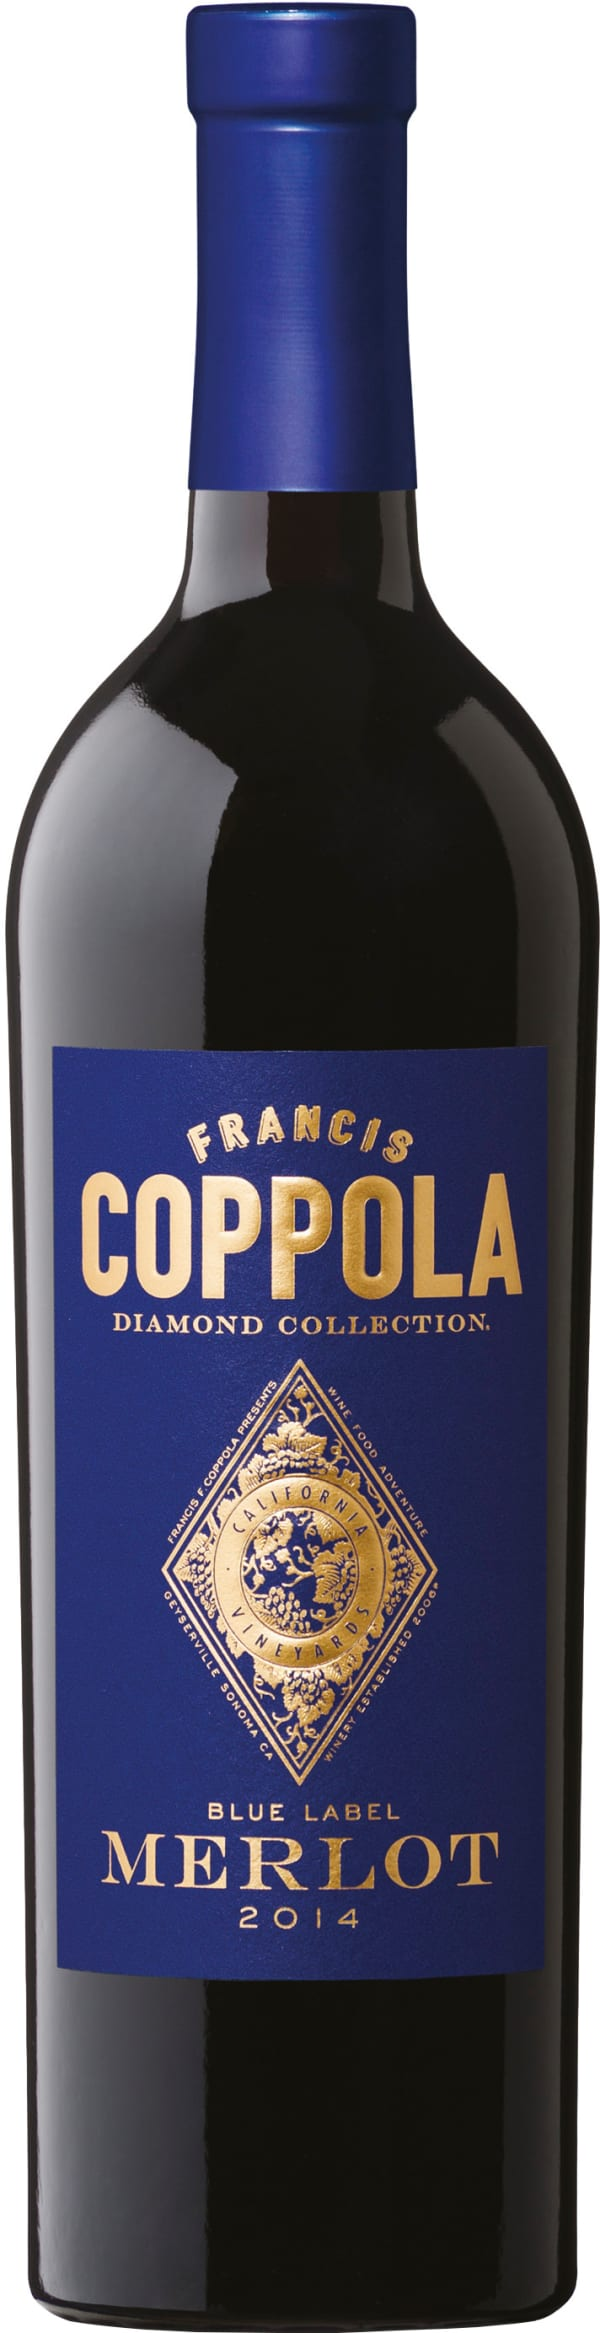 Coppola Diamond Collection Merlot 2016